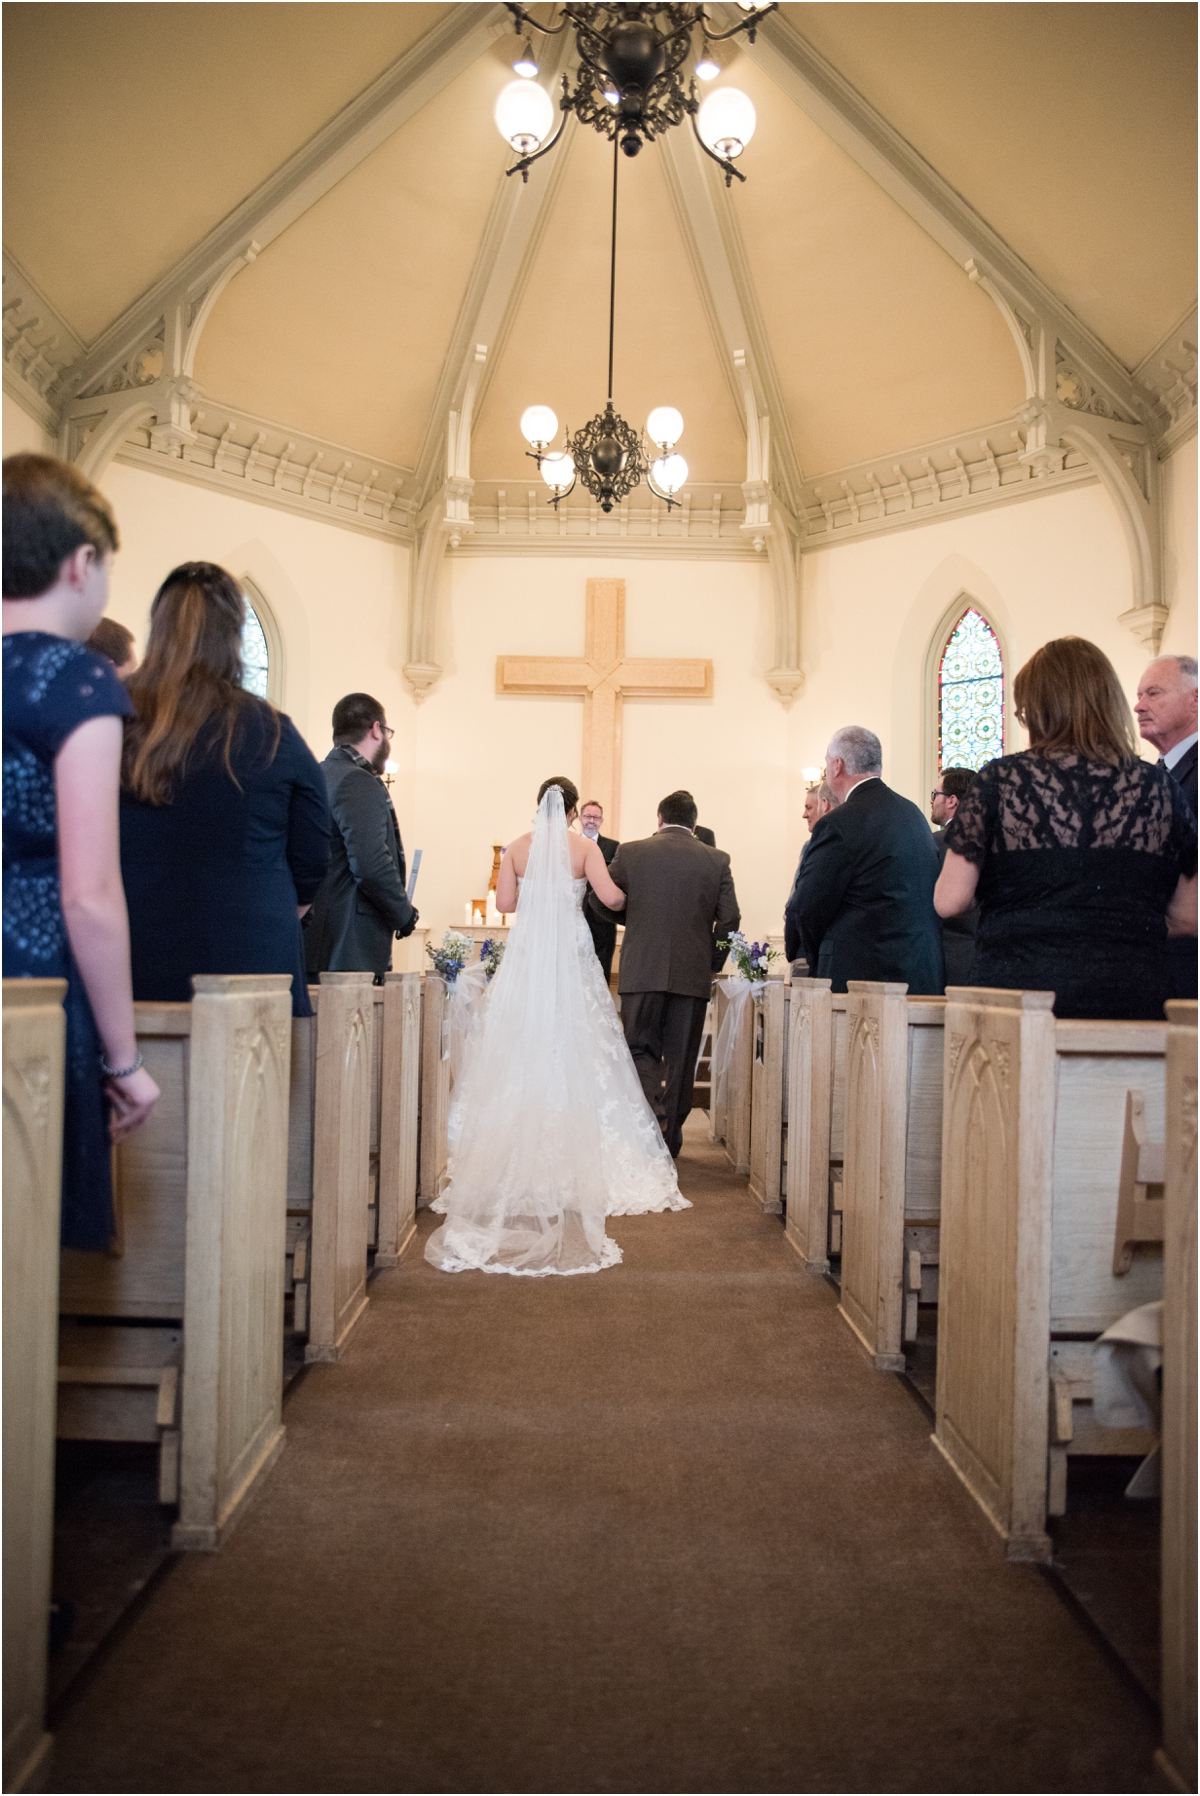 du-denver-wedding_0047.jpg